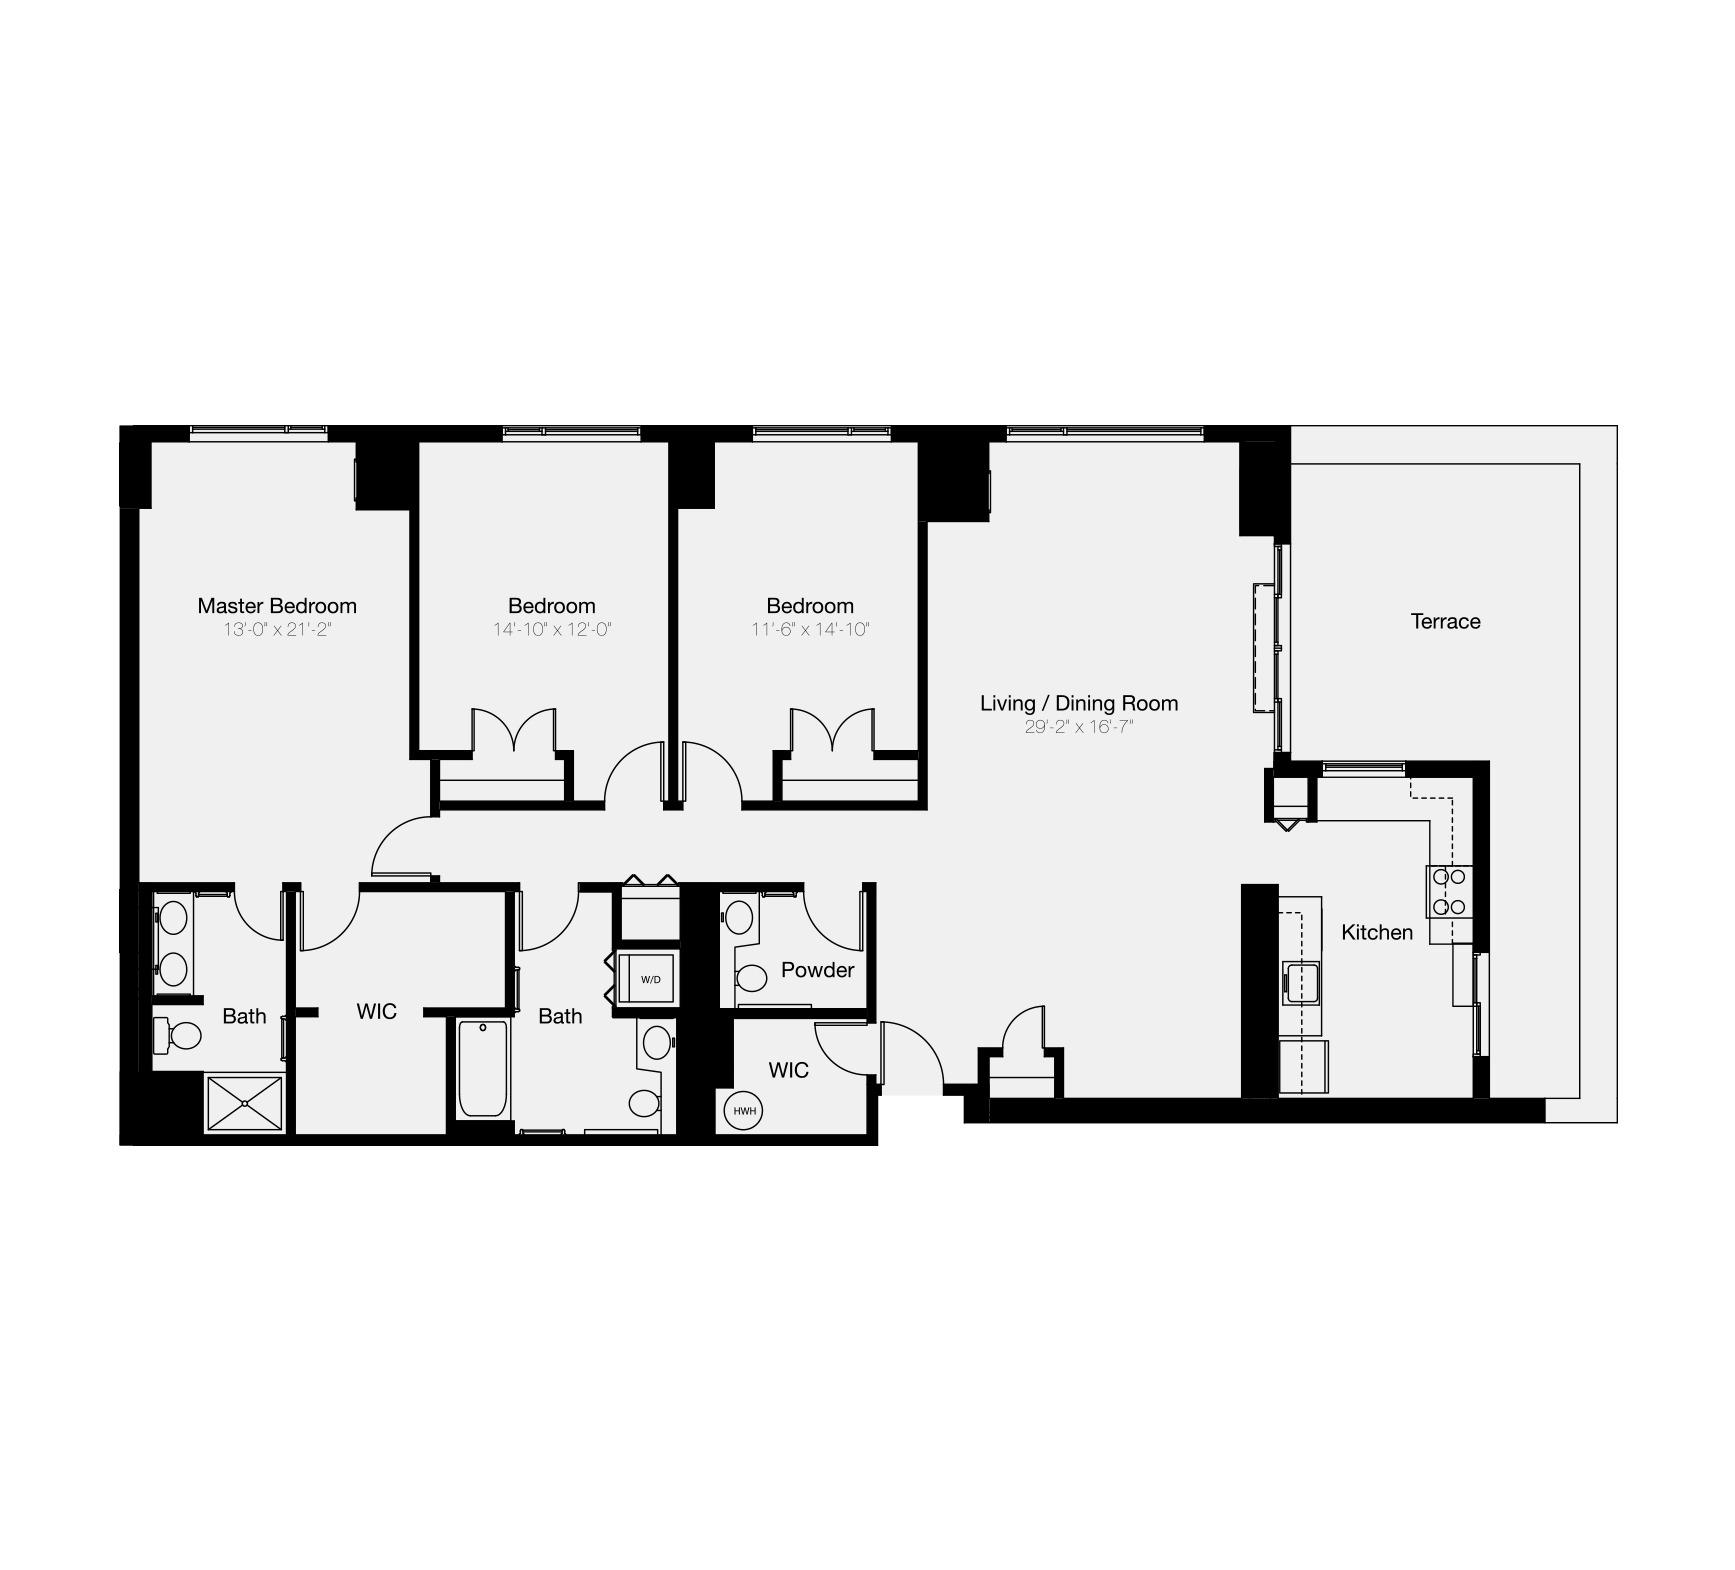 3-bedroom floor plan of Center City Philadelphia condo for sale